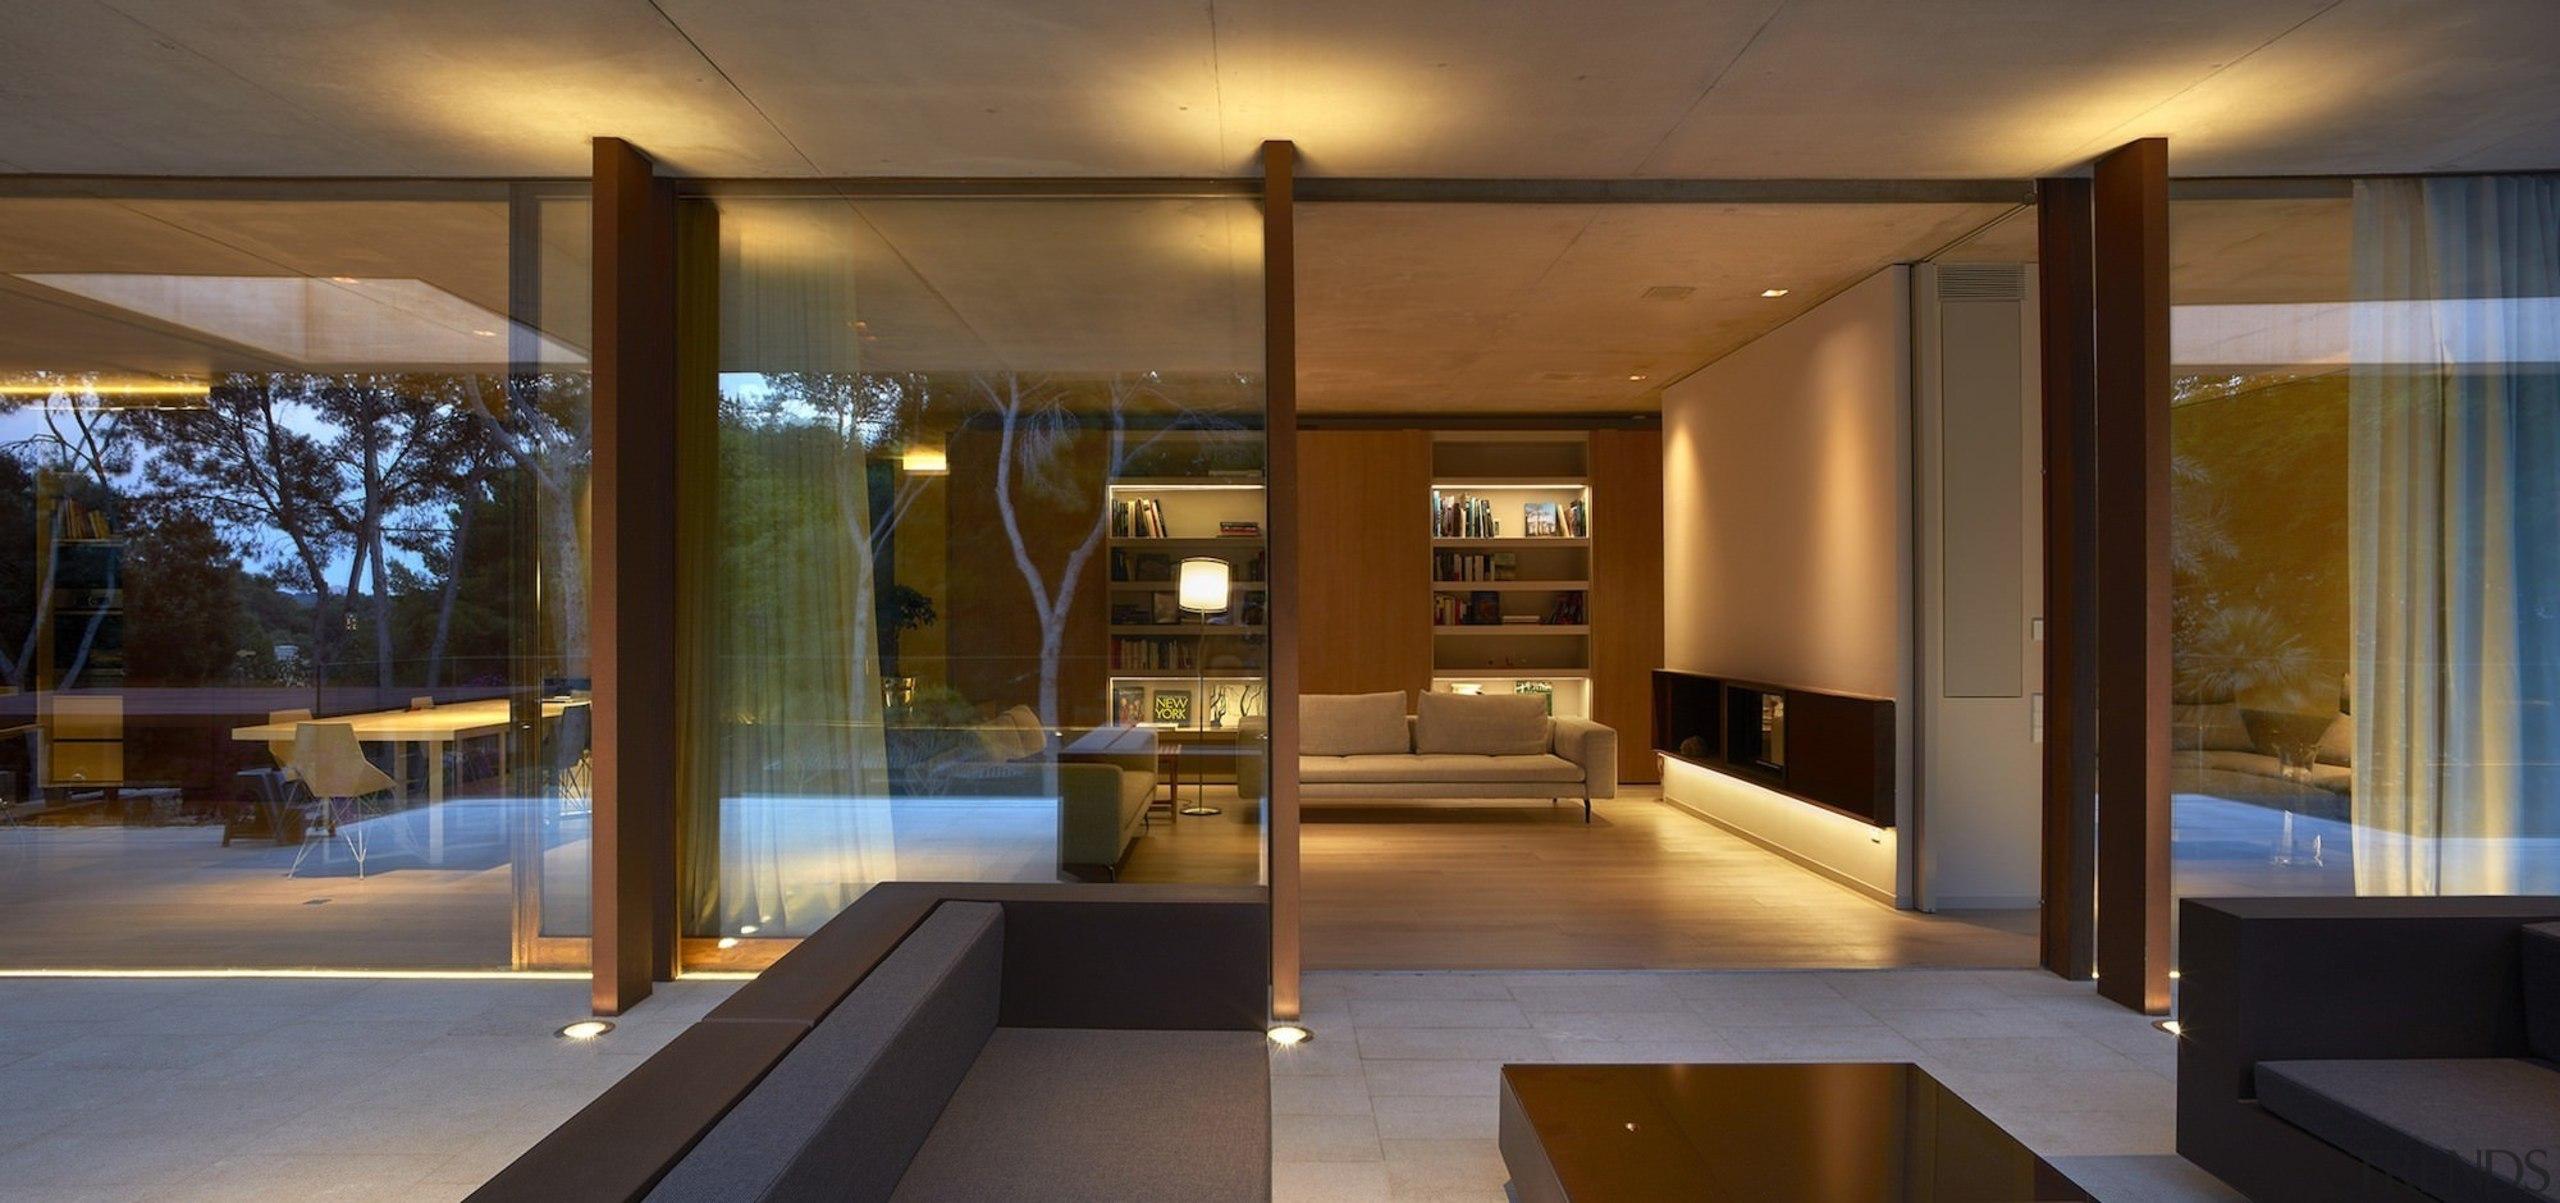 Architect: Ramón Esteve Estudio de Arquitectura architecture, ceiling, home, house, interior design, lighting, living room, lobby, real estate, window, brown